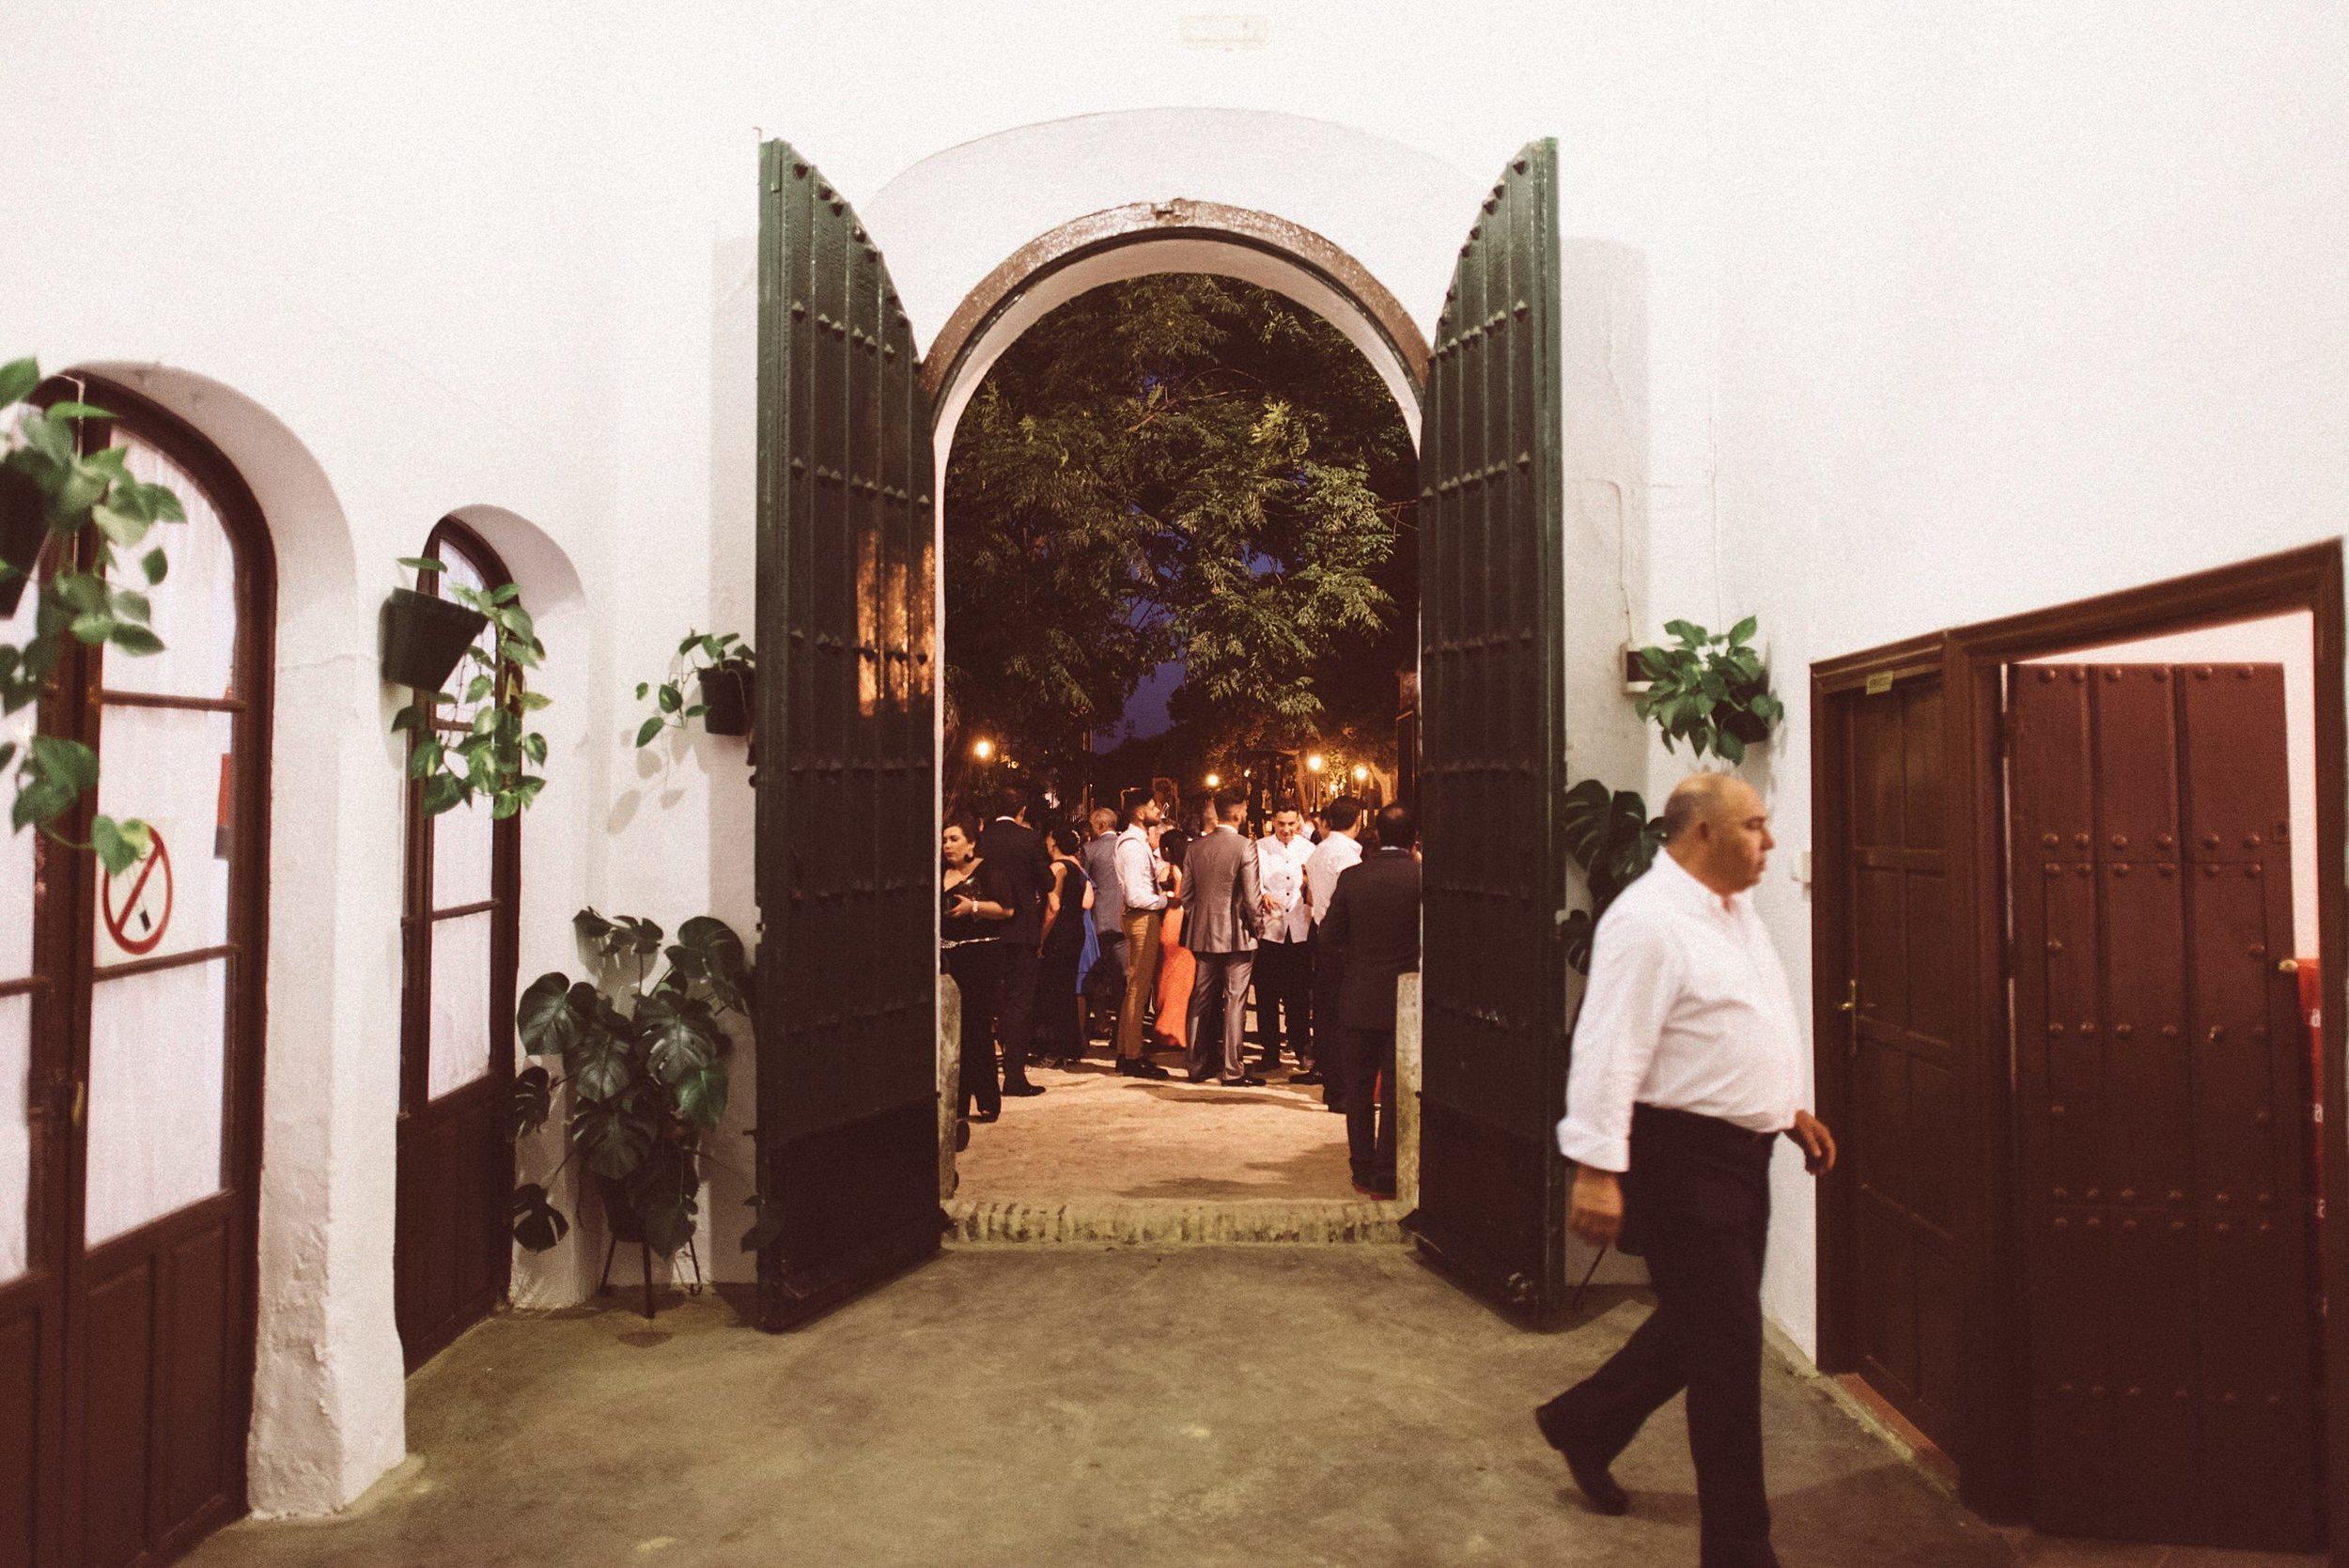 Boda en Utrera - Sevilla - Consolacion - Santuario - Alicia & Jesus DSC_4626exposure.jpg